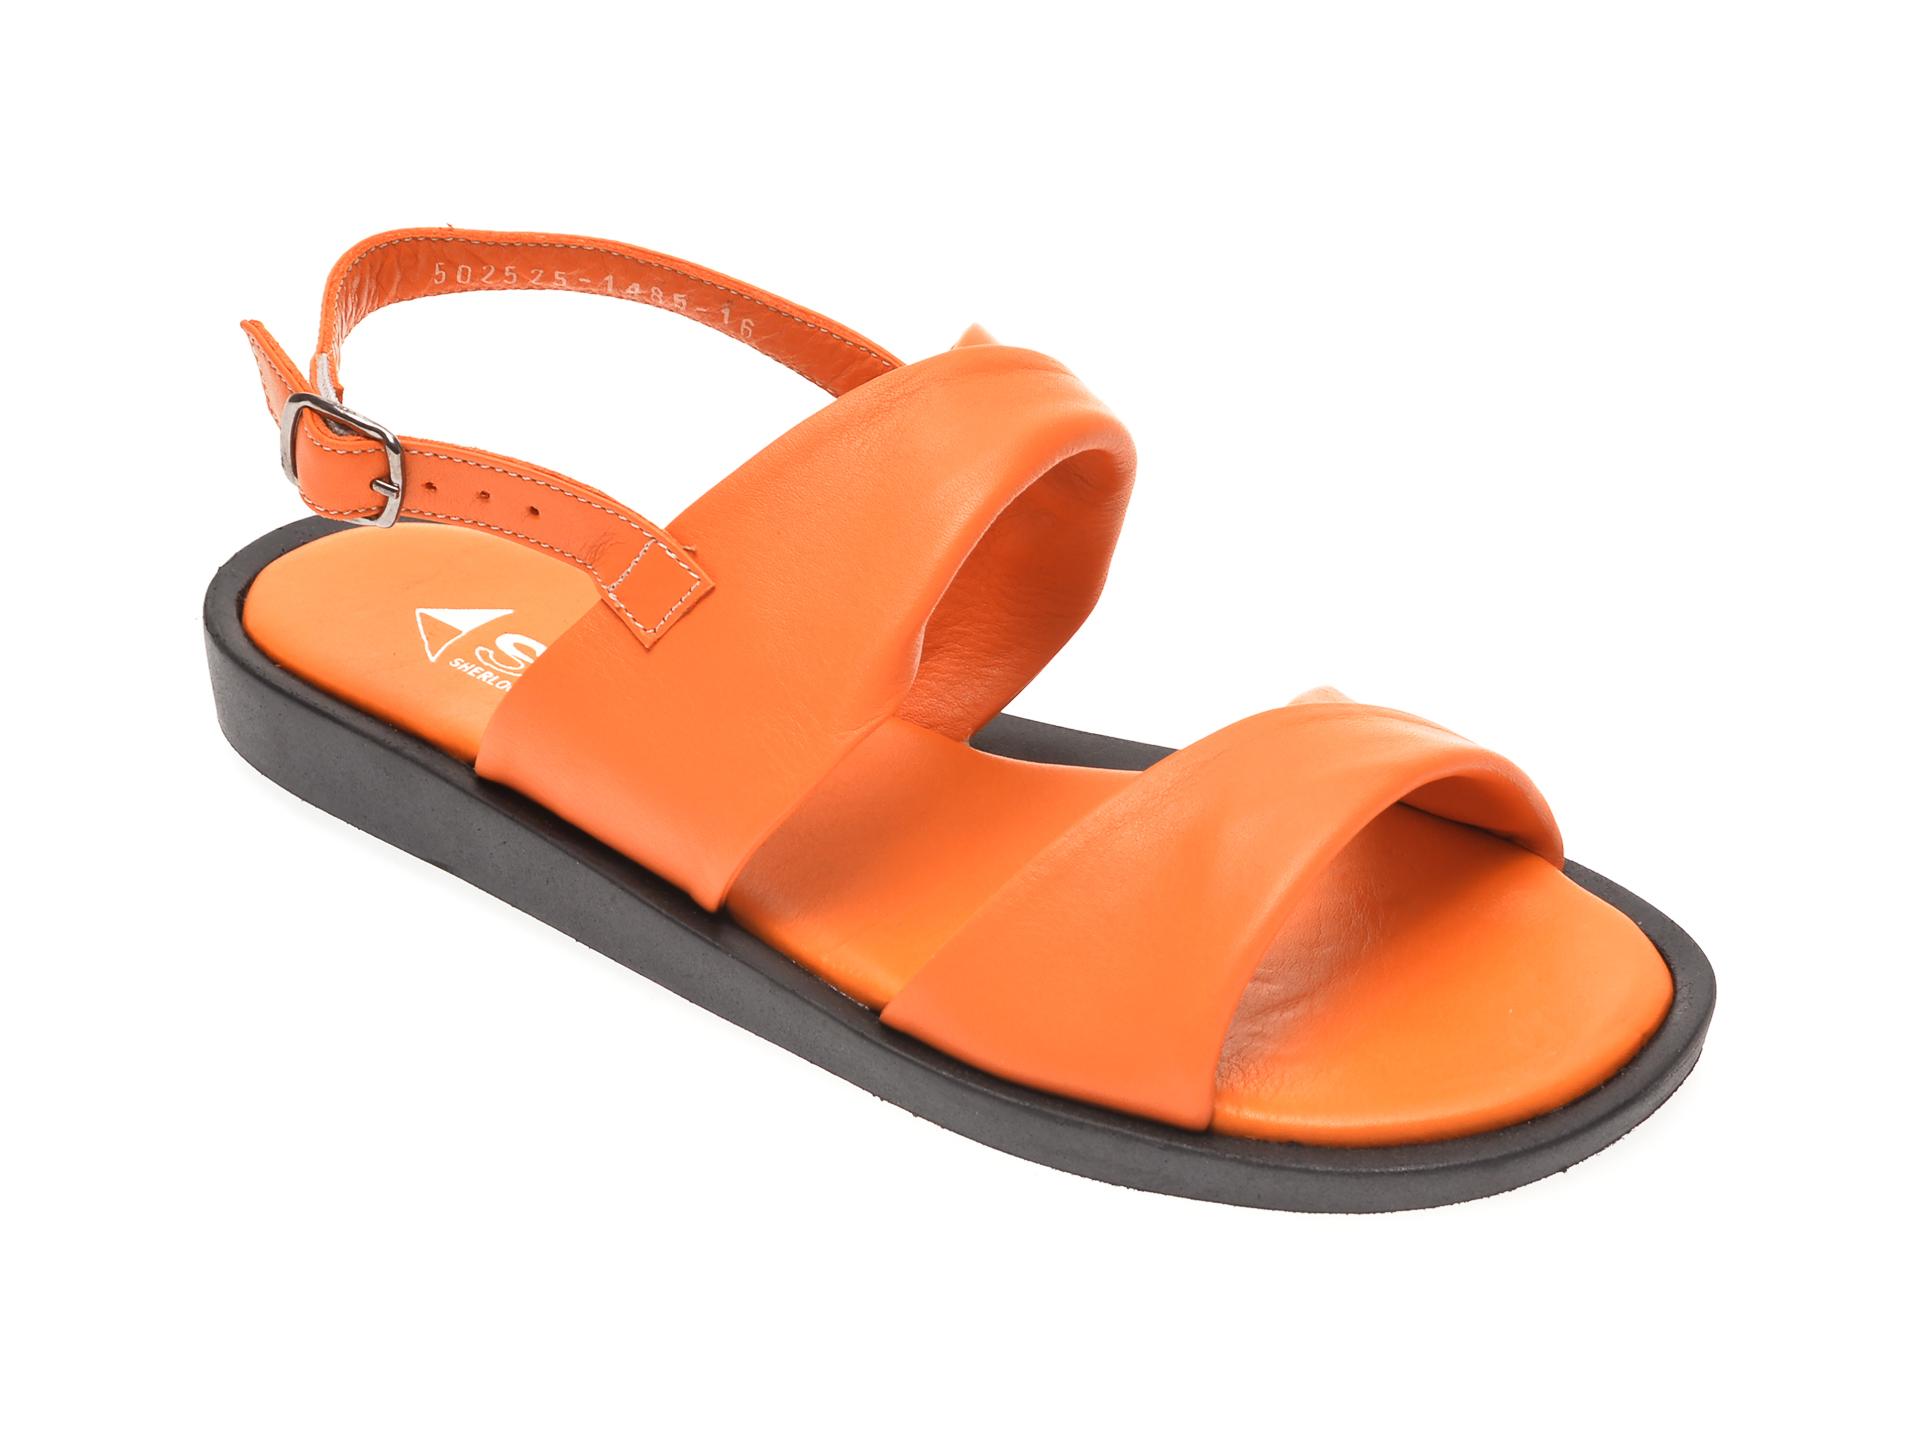 Sandale MISS LIZA portocalii, 1182525, din piele naturala